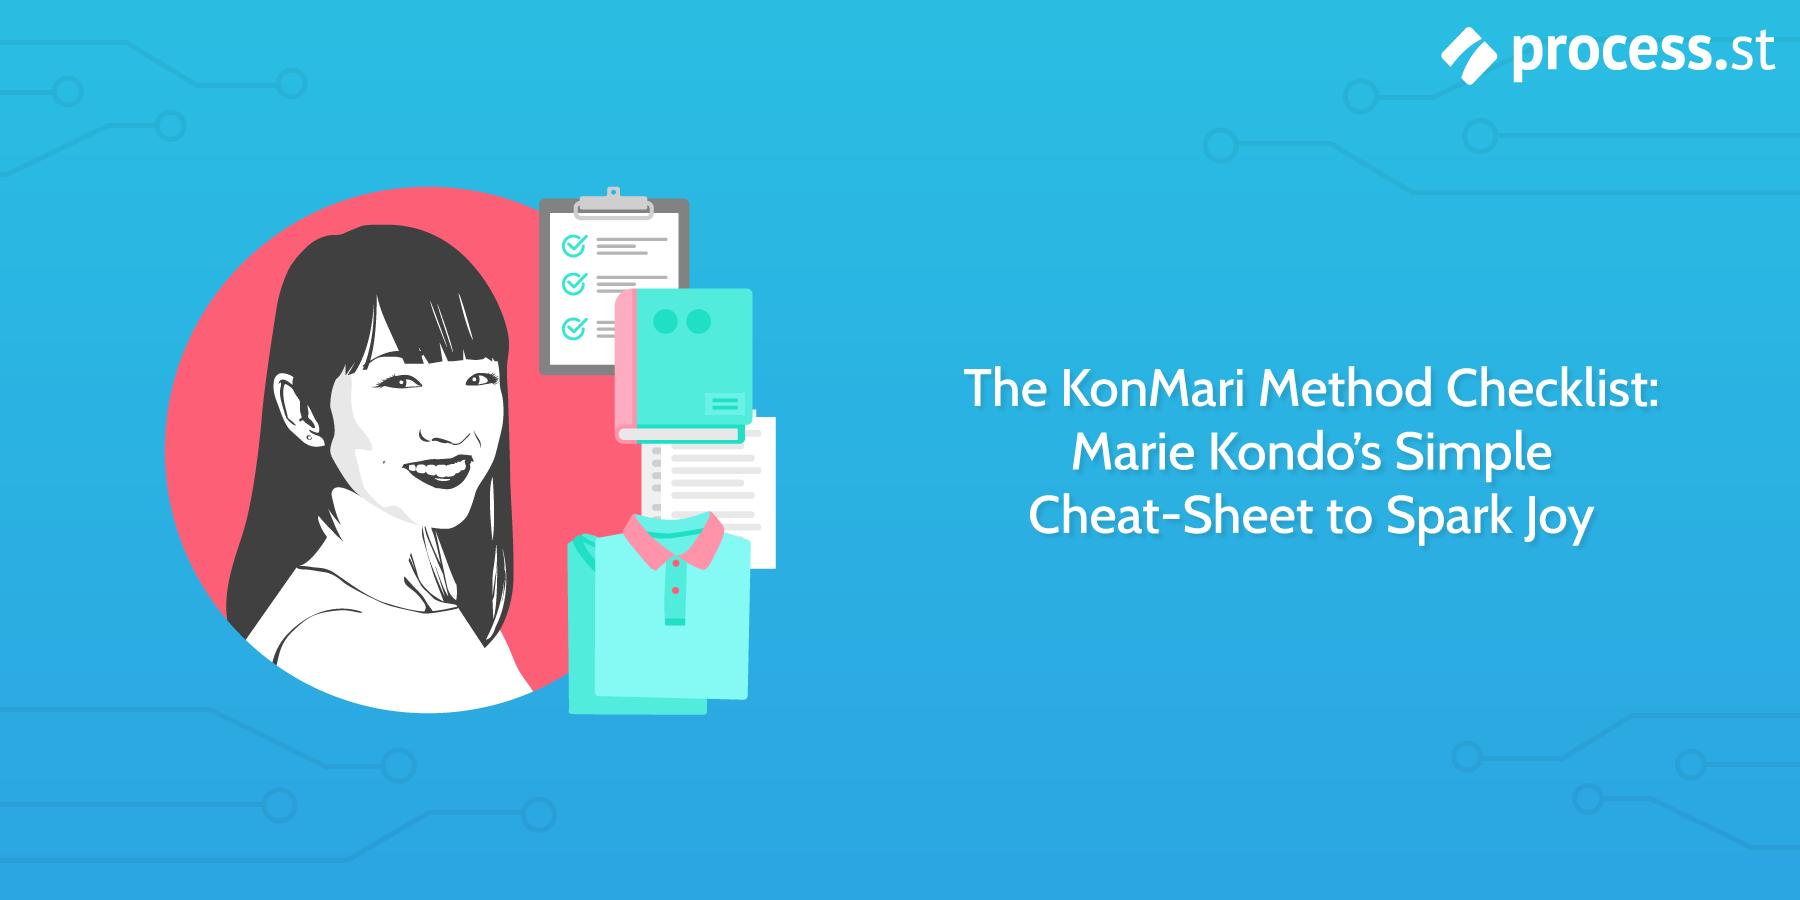 The KonMari Method Checklist